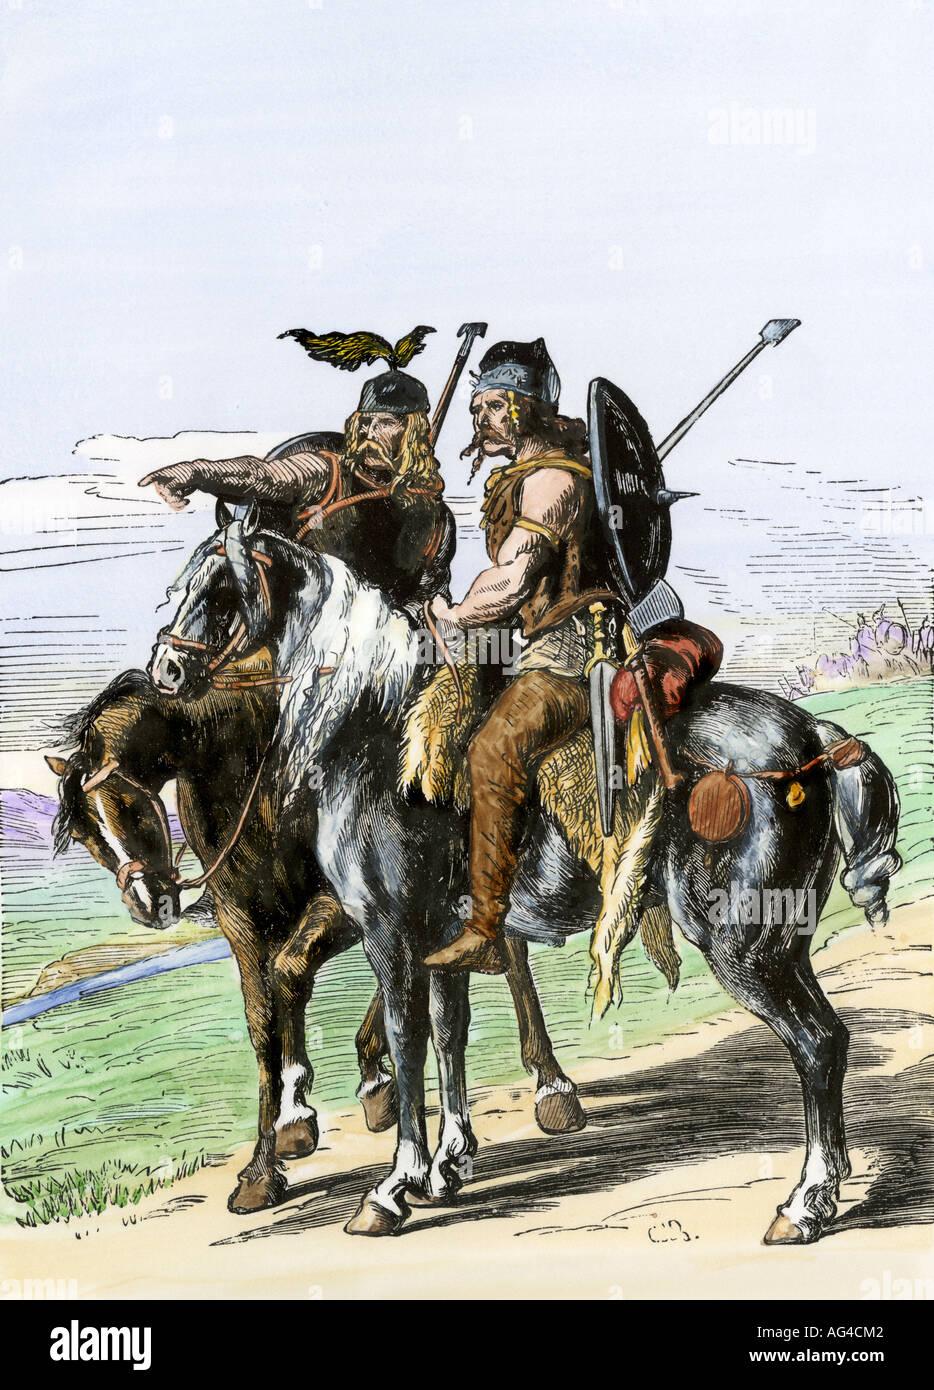 Gauls on horseback under the Roman Empire. Hand-colored woodcut - Stock Image